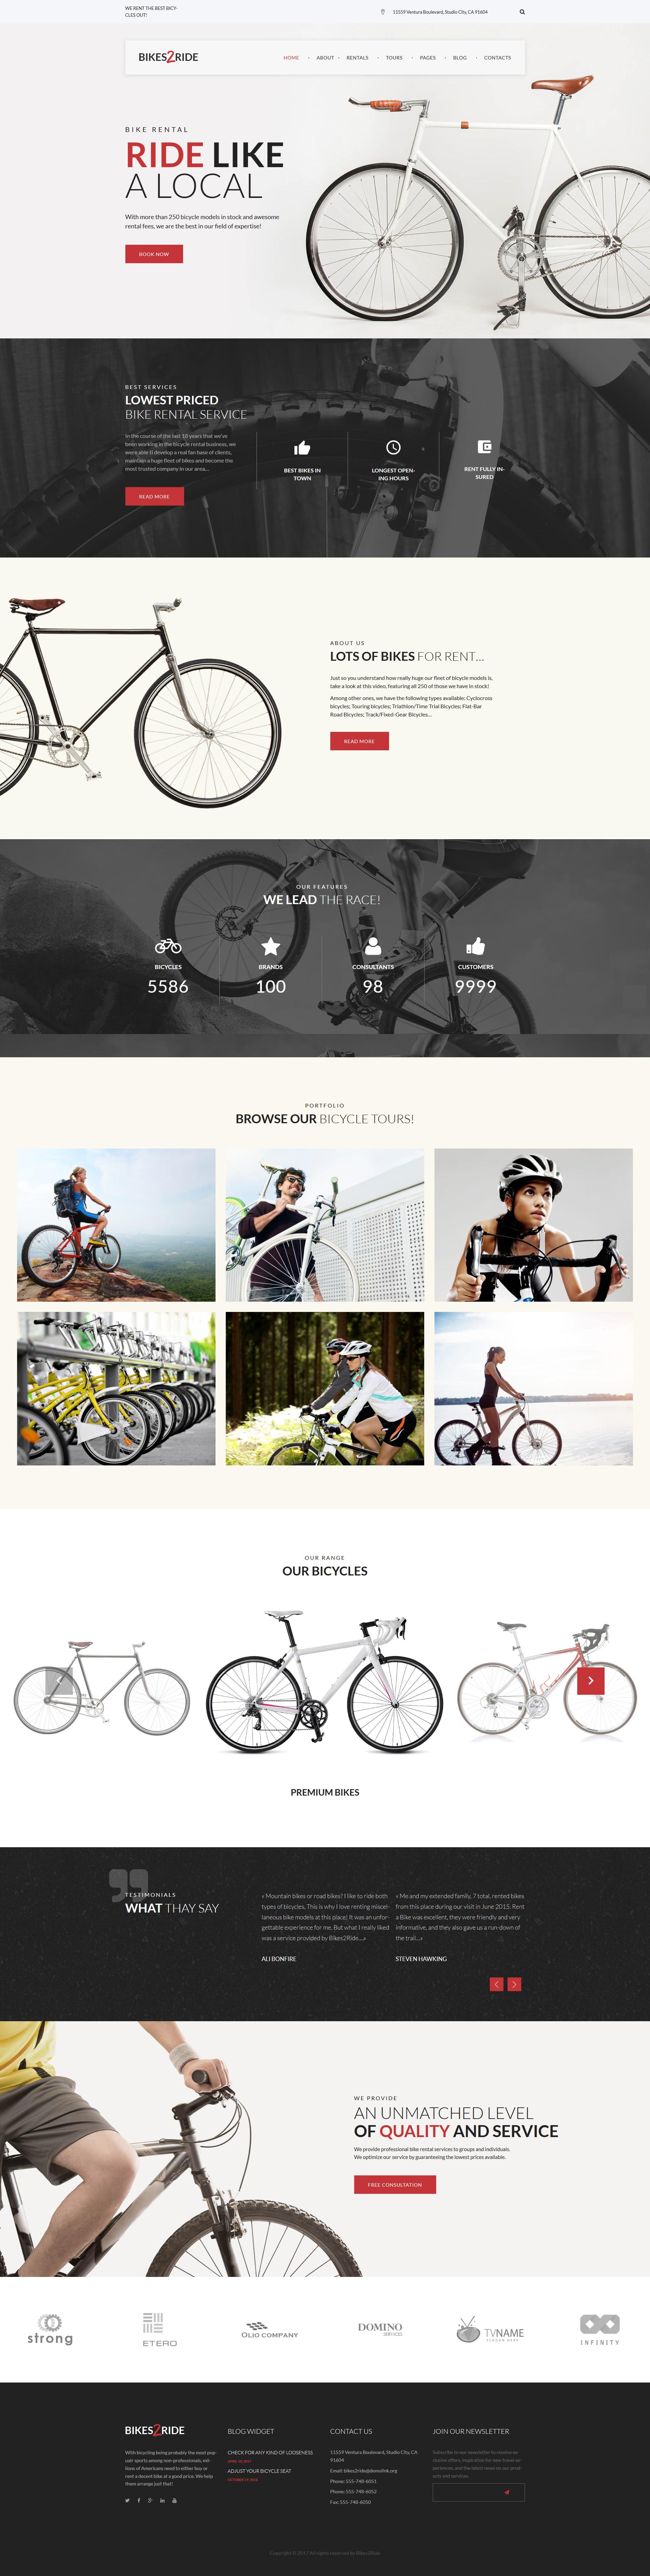 """Bikes2Ride - Cycling"" 响应式WordPress模板 #64031"